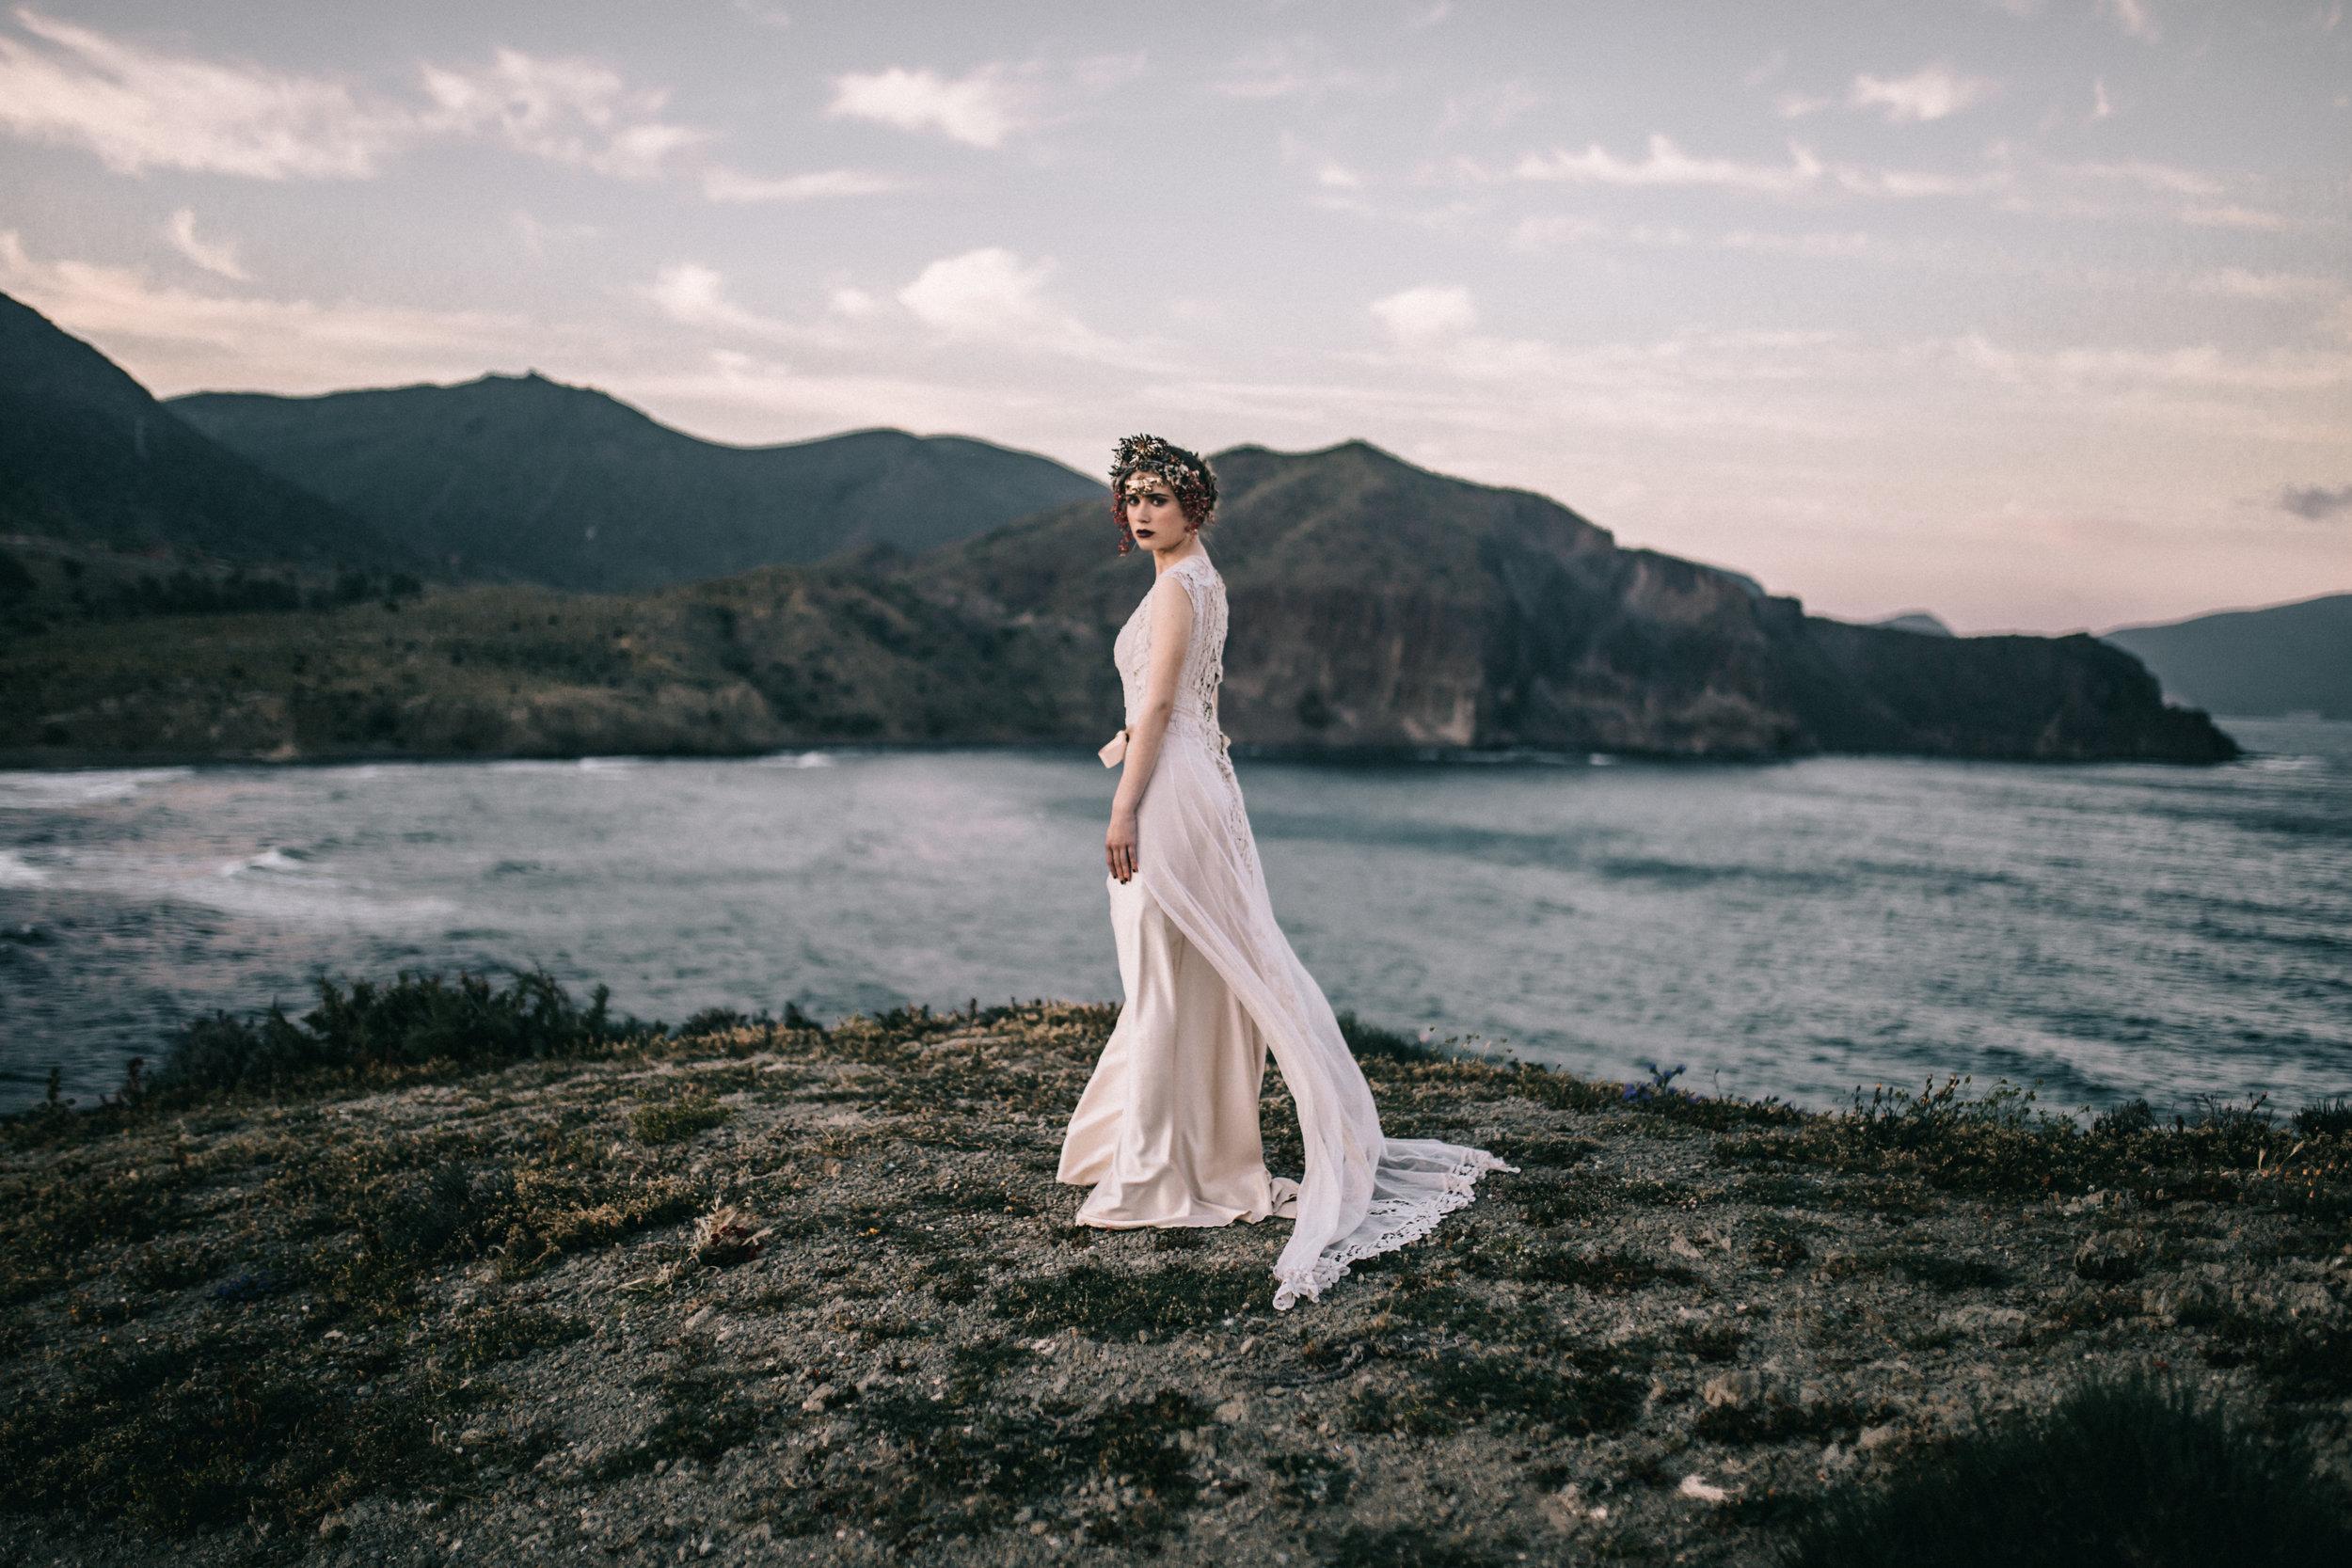 thenortherngirlphotography-preboda_weddingbarcelona_folkwedding_destinationwedding_editorial_fashion_weddingeditorial_lauraescribanoatelier_marucca_yemaya_ladiosadelmar-163.jpg